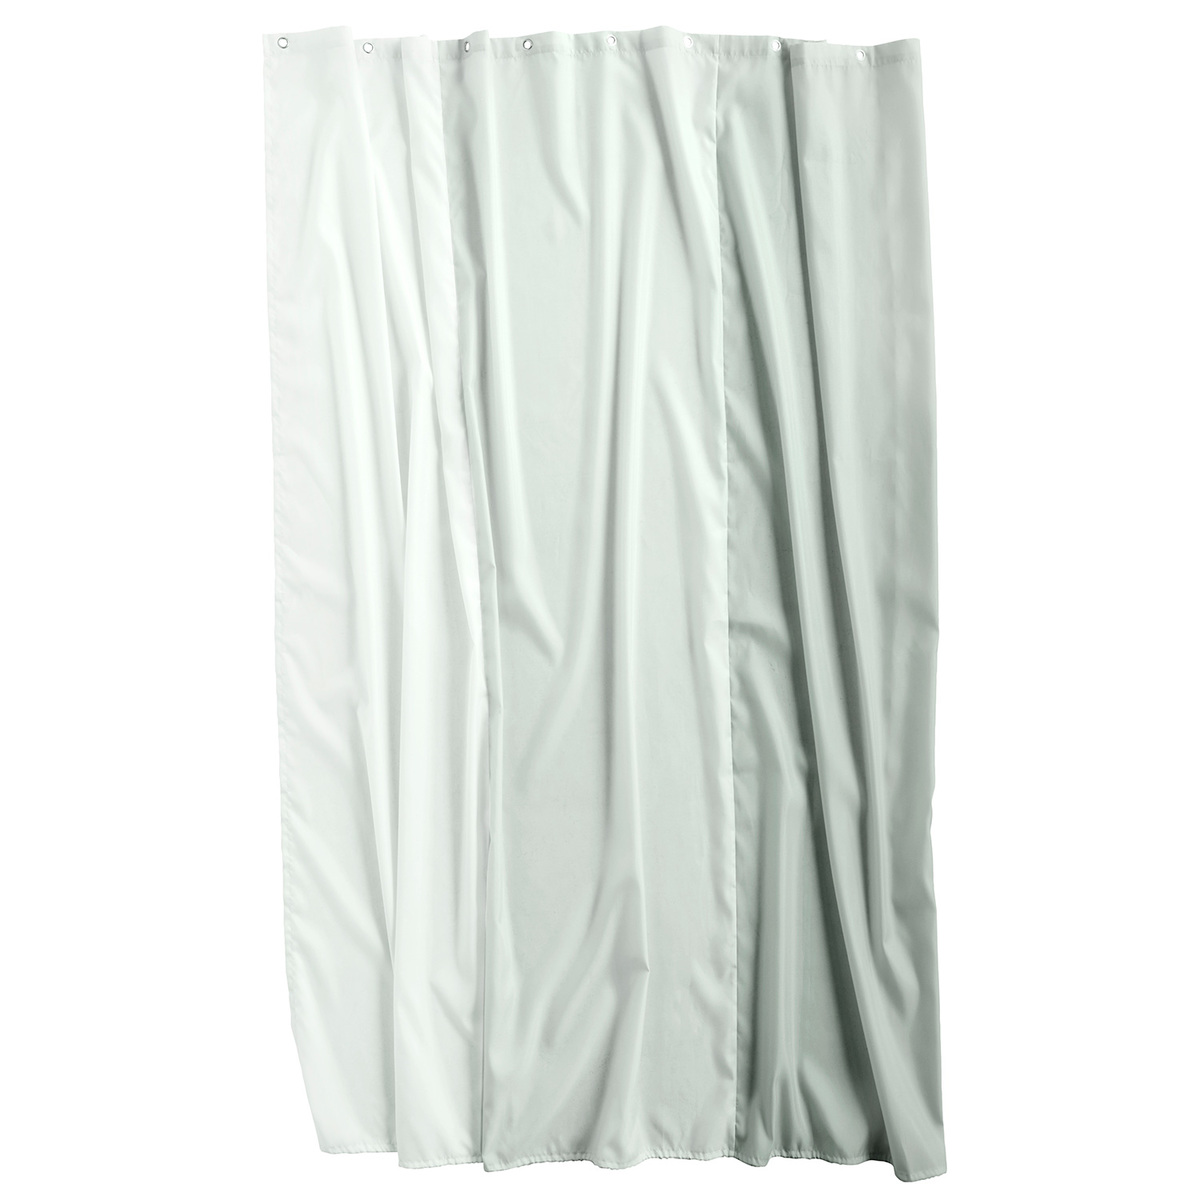 Hay Aquarelle Vertical Shower Curtain Eucalyptus Finnish